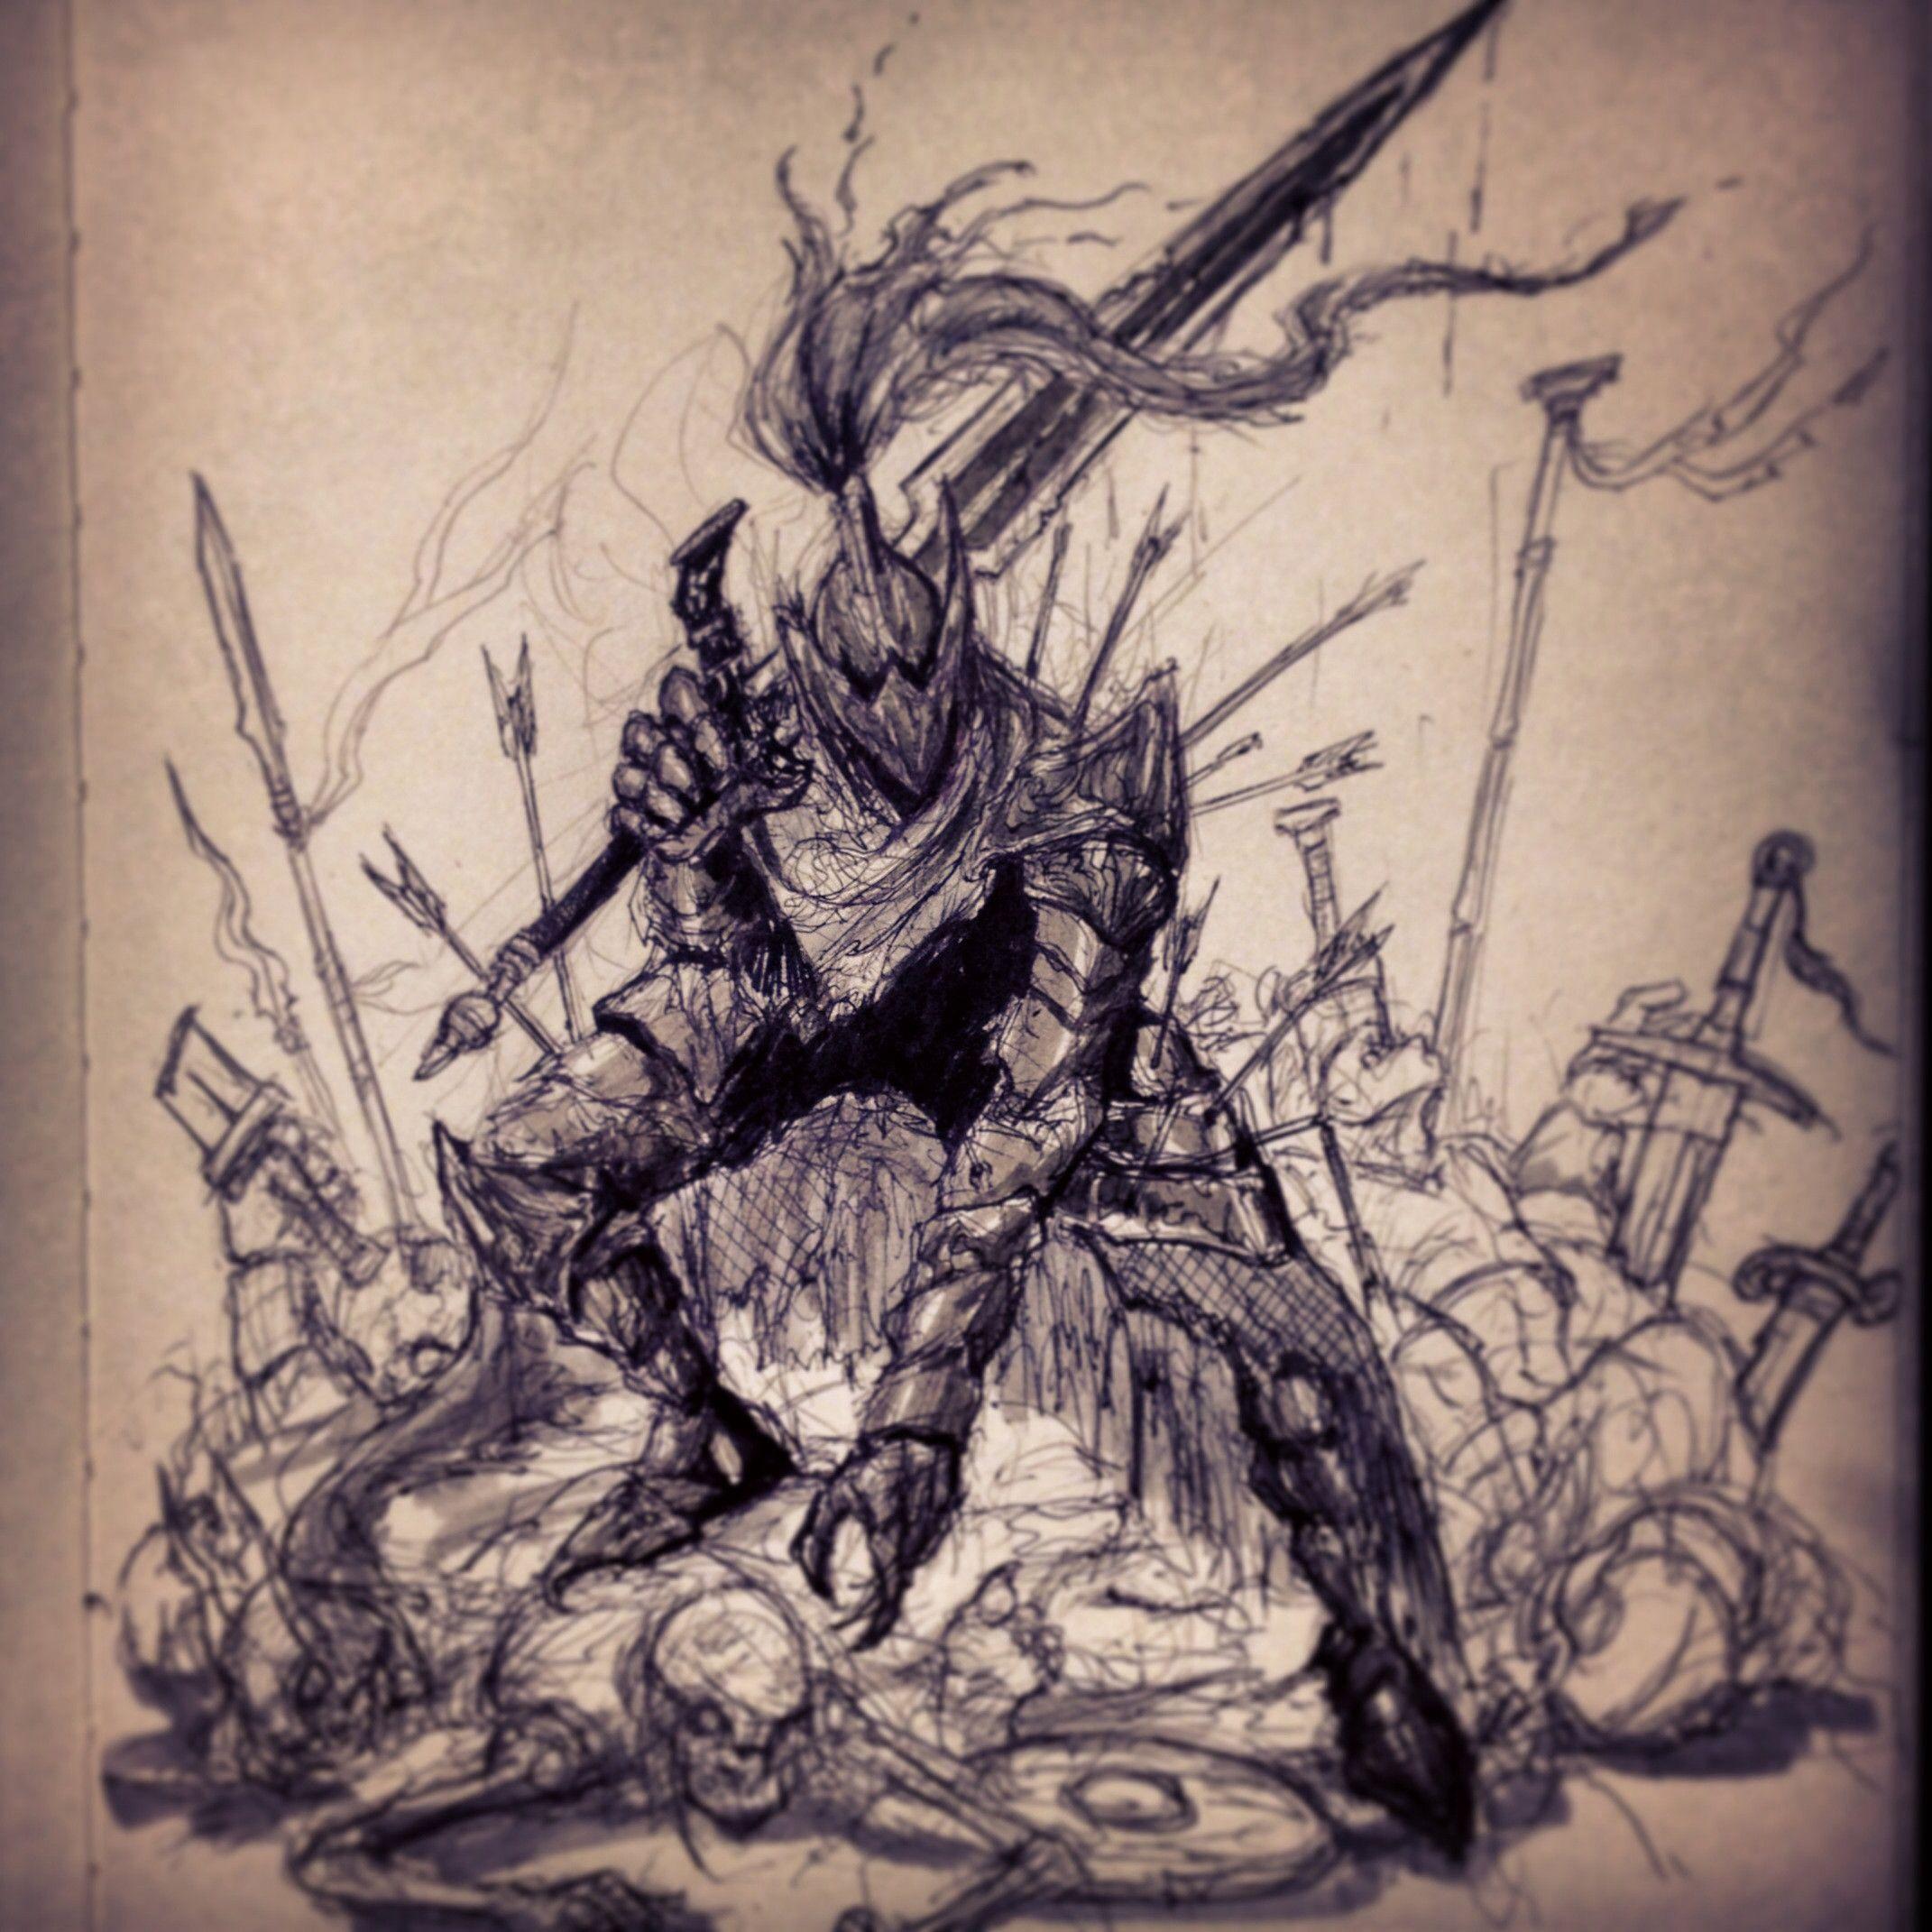 Artorias senpai (Dark Souls). - Imgur